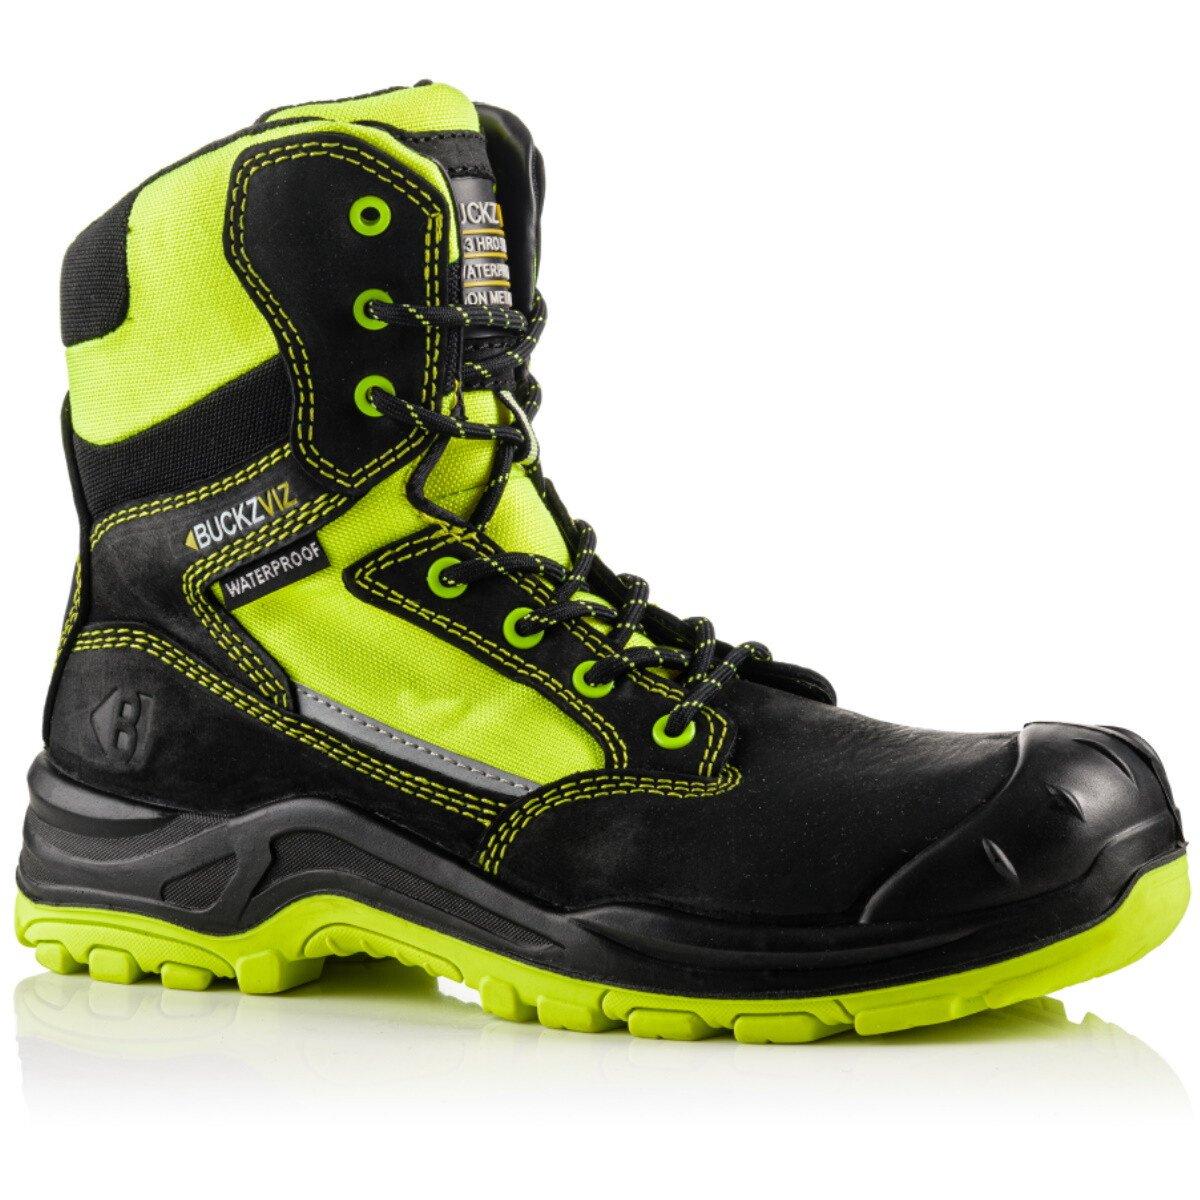 Buckbootz BVIZ1 Buckz Viz Black or Brown Leather/Hi-Viz Cordura S3 Non Metallic Lace/Zipper Safety Boot